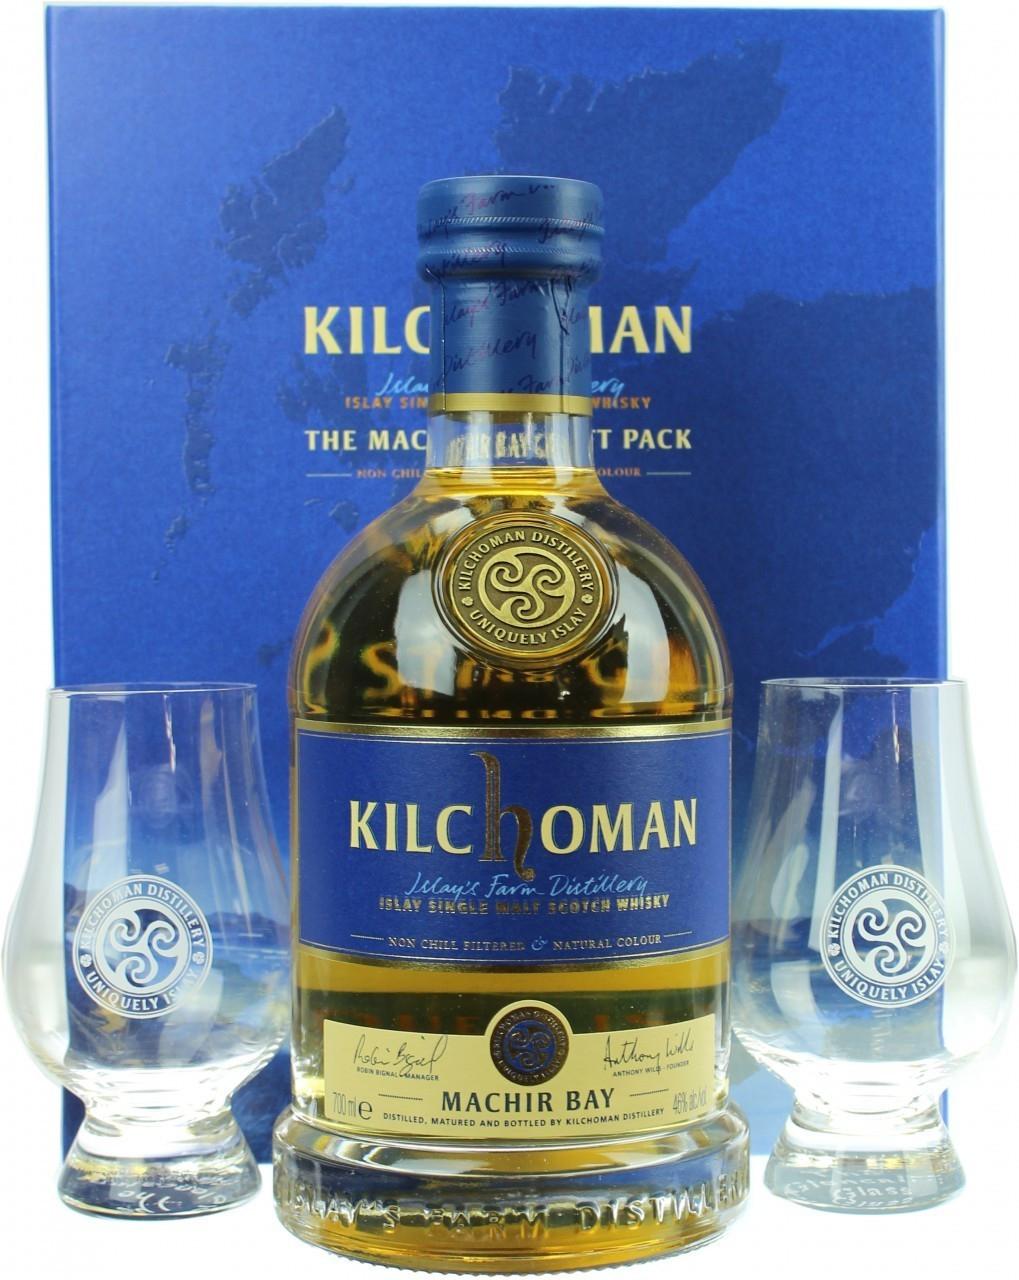 [D12] Donnerstagsdeal Kilchoman Machir Bay Gift Pack, 0,7 l, 46% inkl. 2 Gläsern